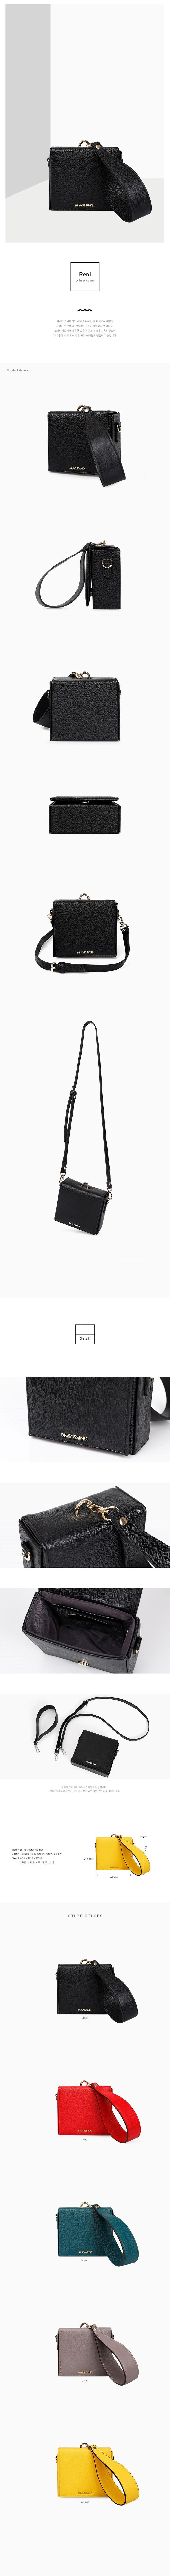 black720.jpg